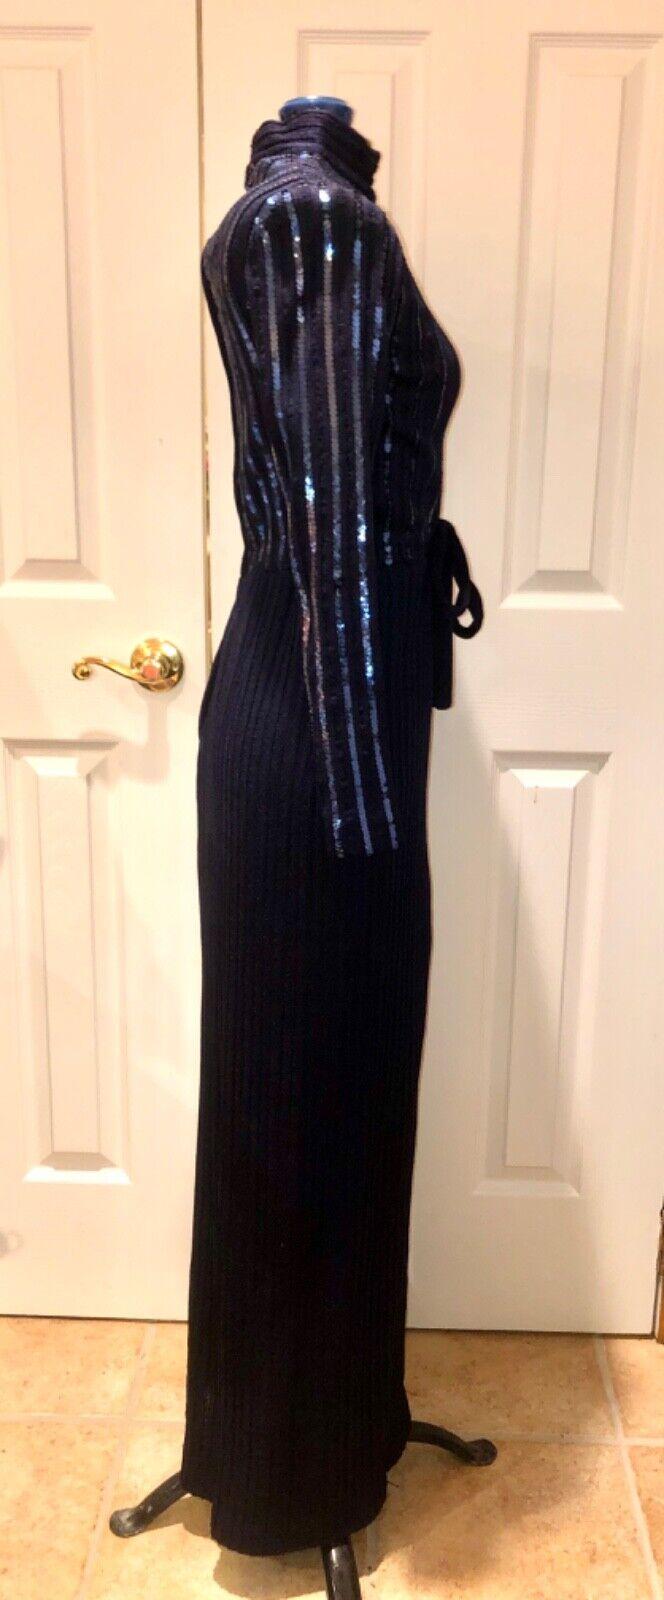 roger milot for fred perlberg Vintage 60s dress disco dress